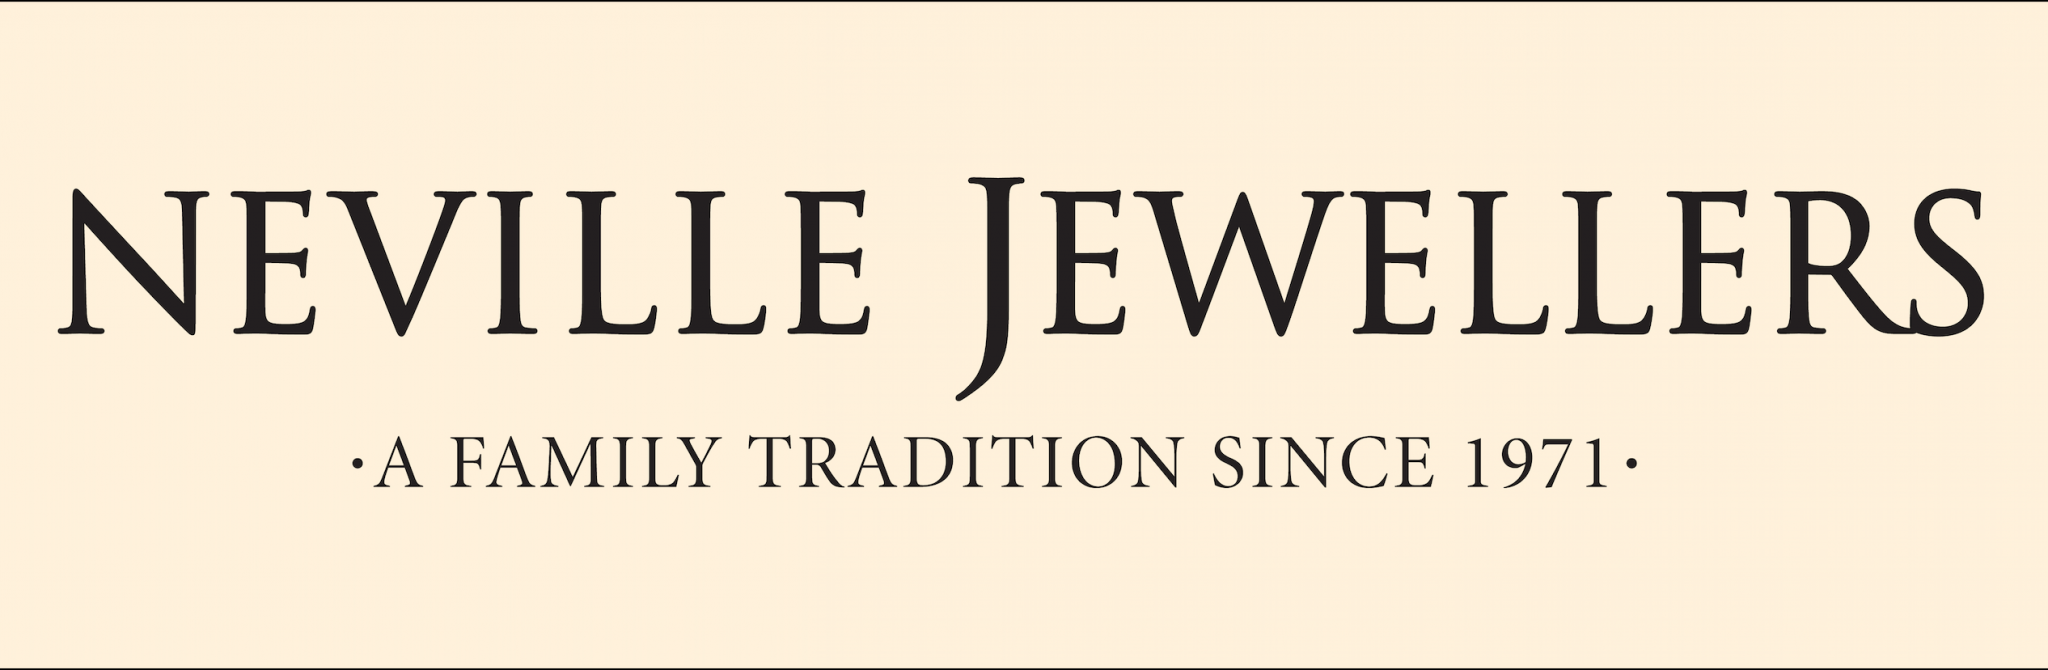 Nevilles Jewellers